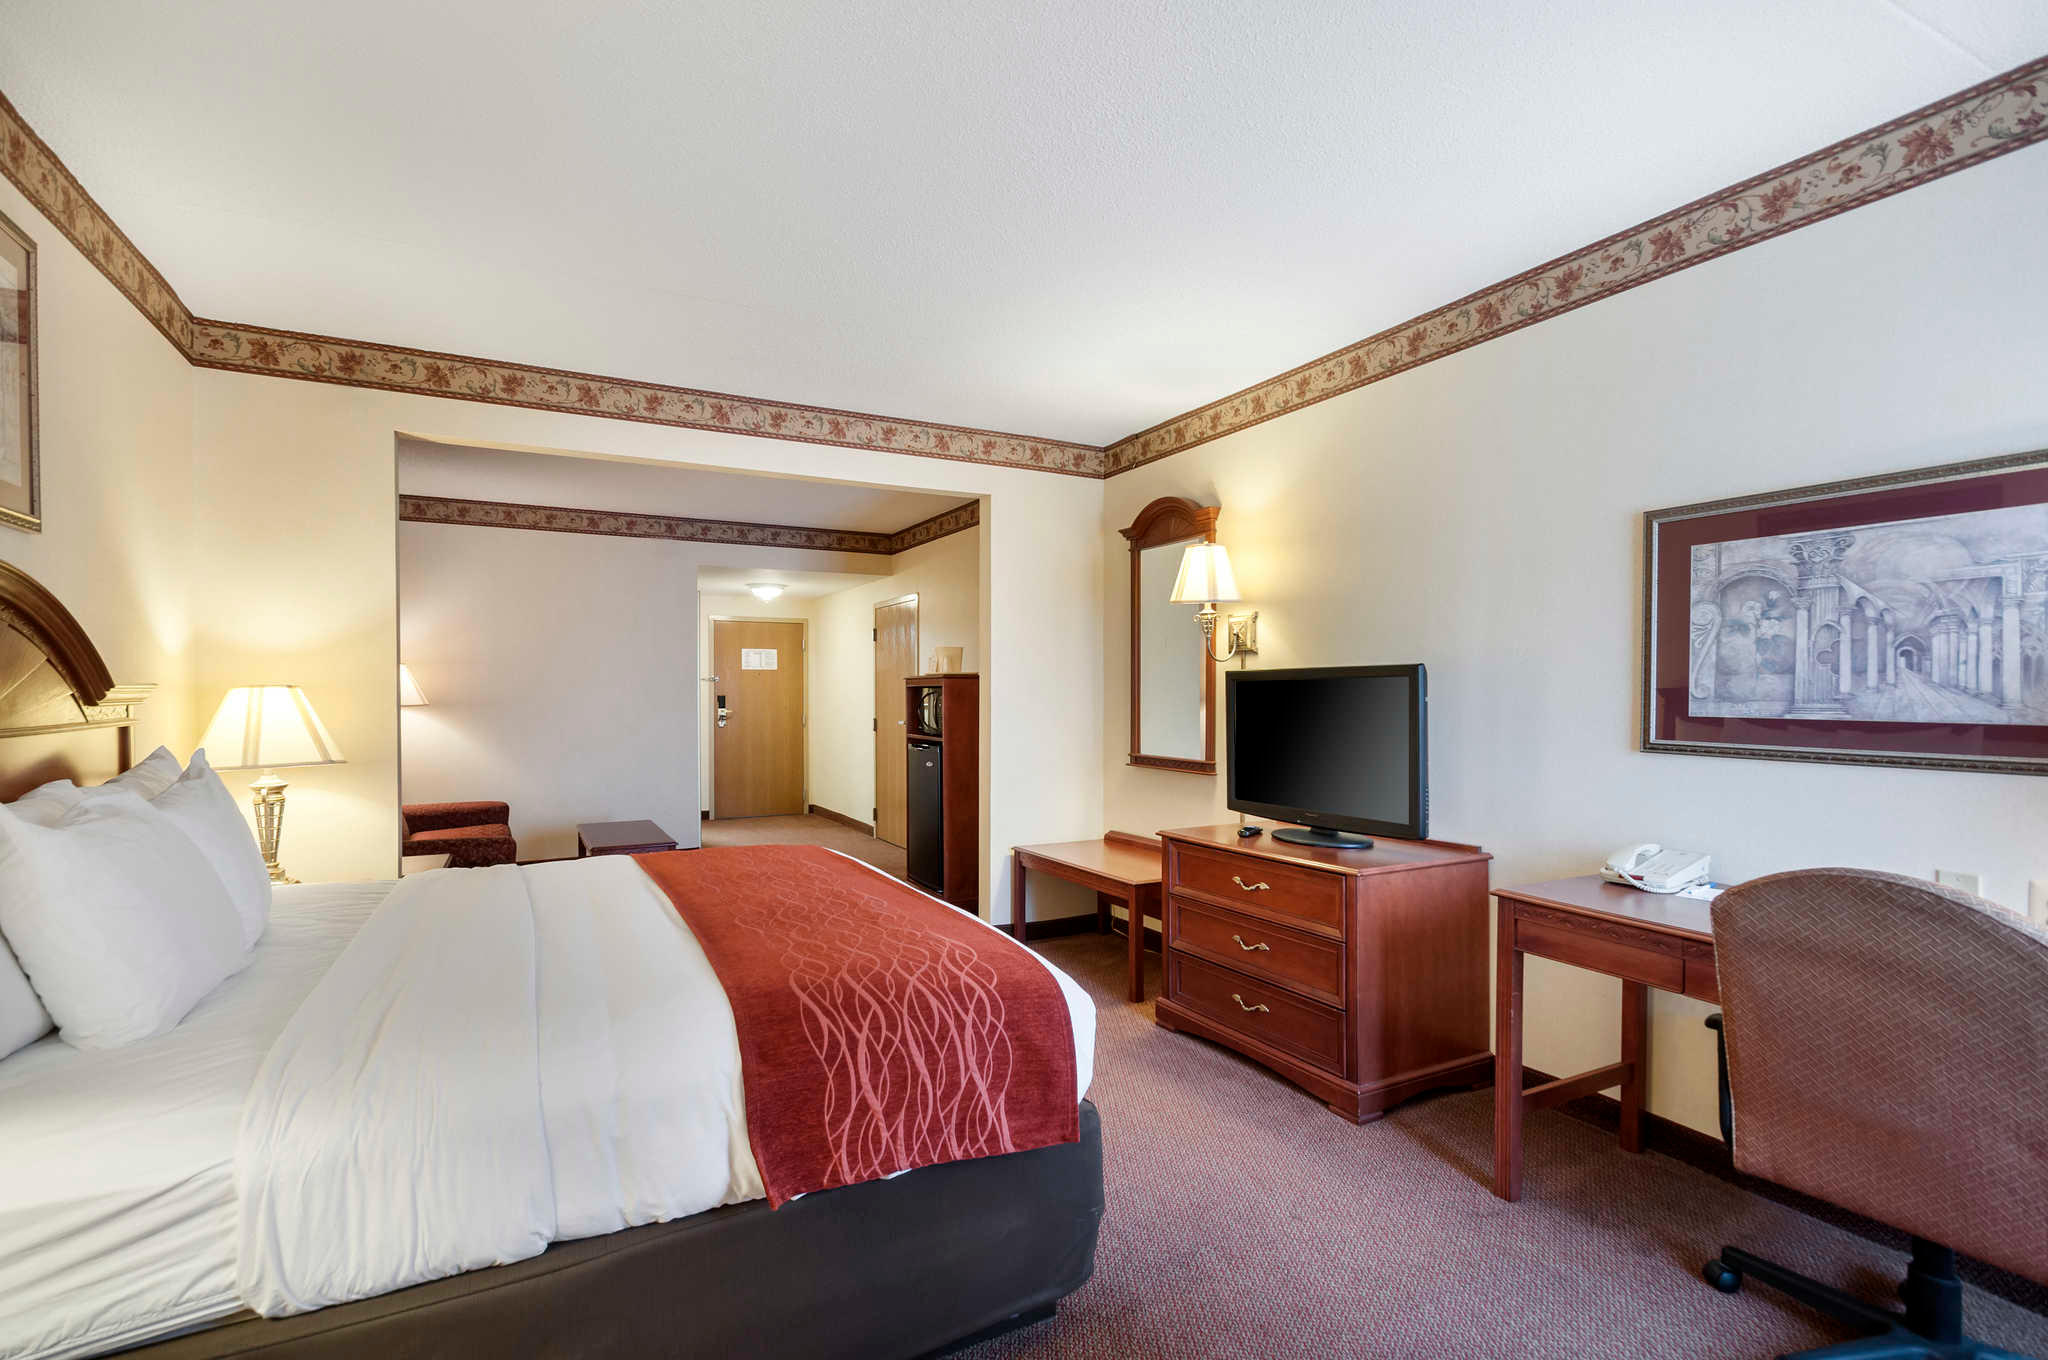 Comfort Inn & Suites Edgewood - Aberdeen image 13